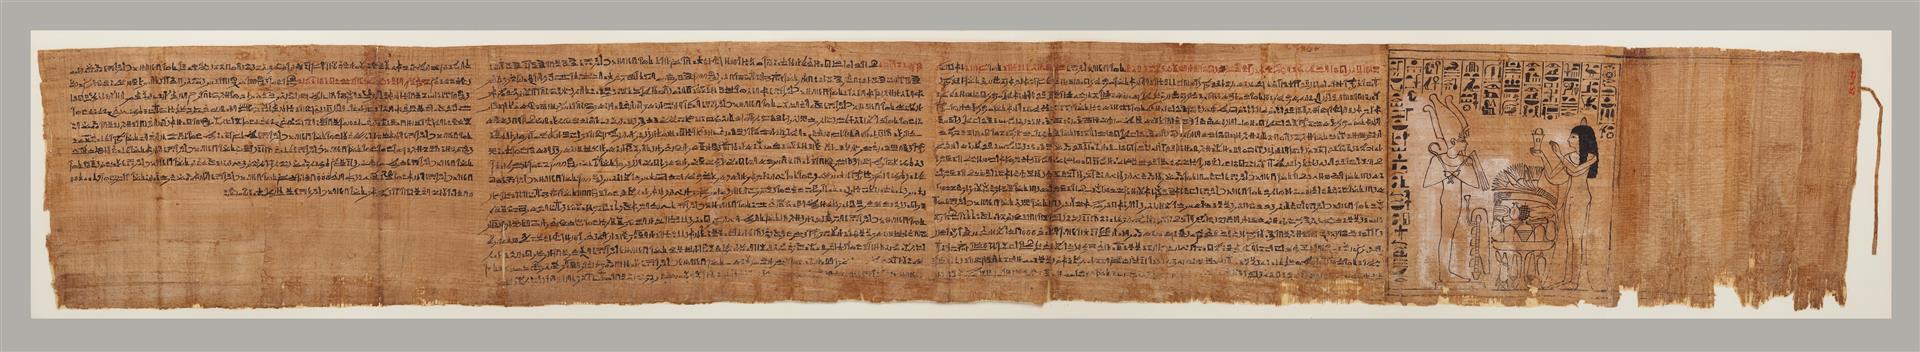 Henettawy (C)'s Book of the Dead, c.990 - c.970